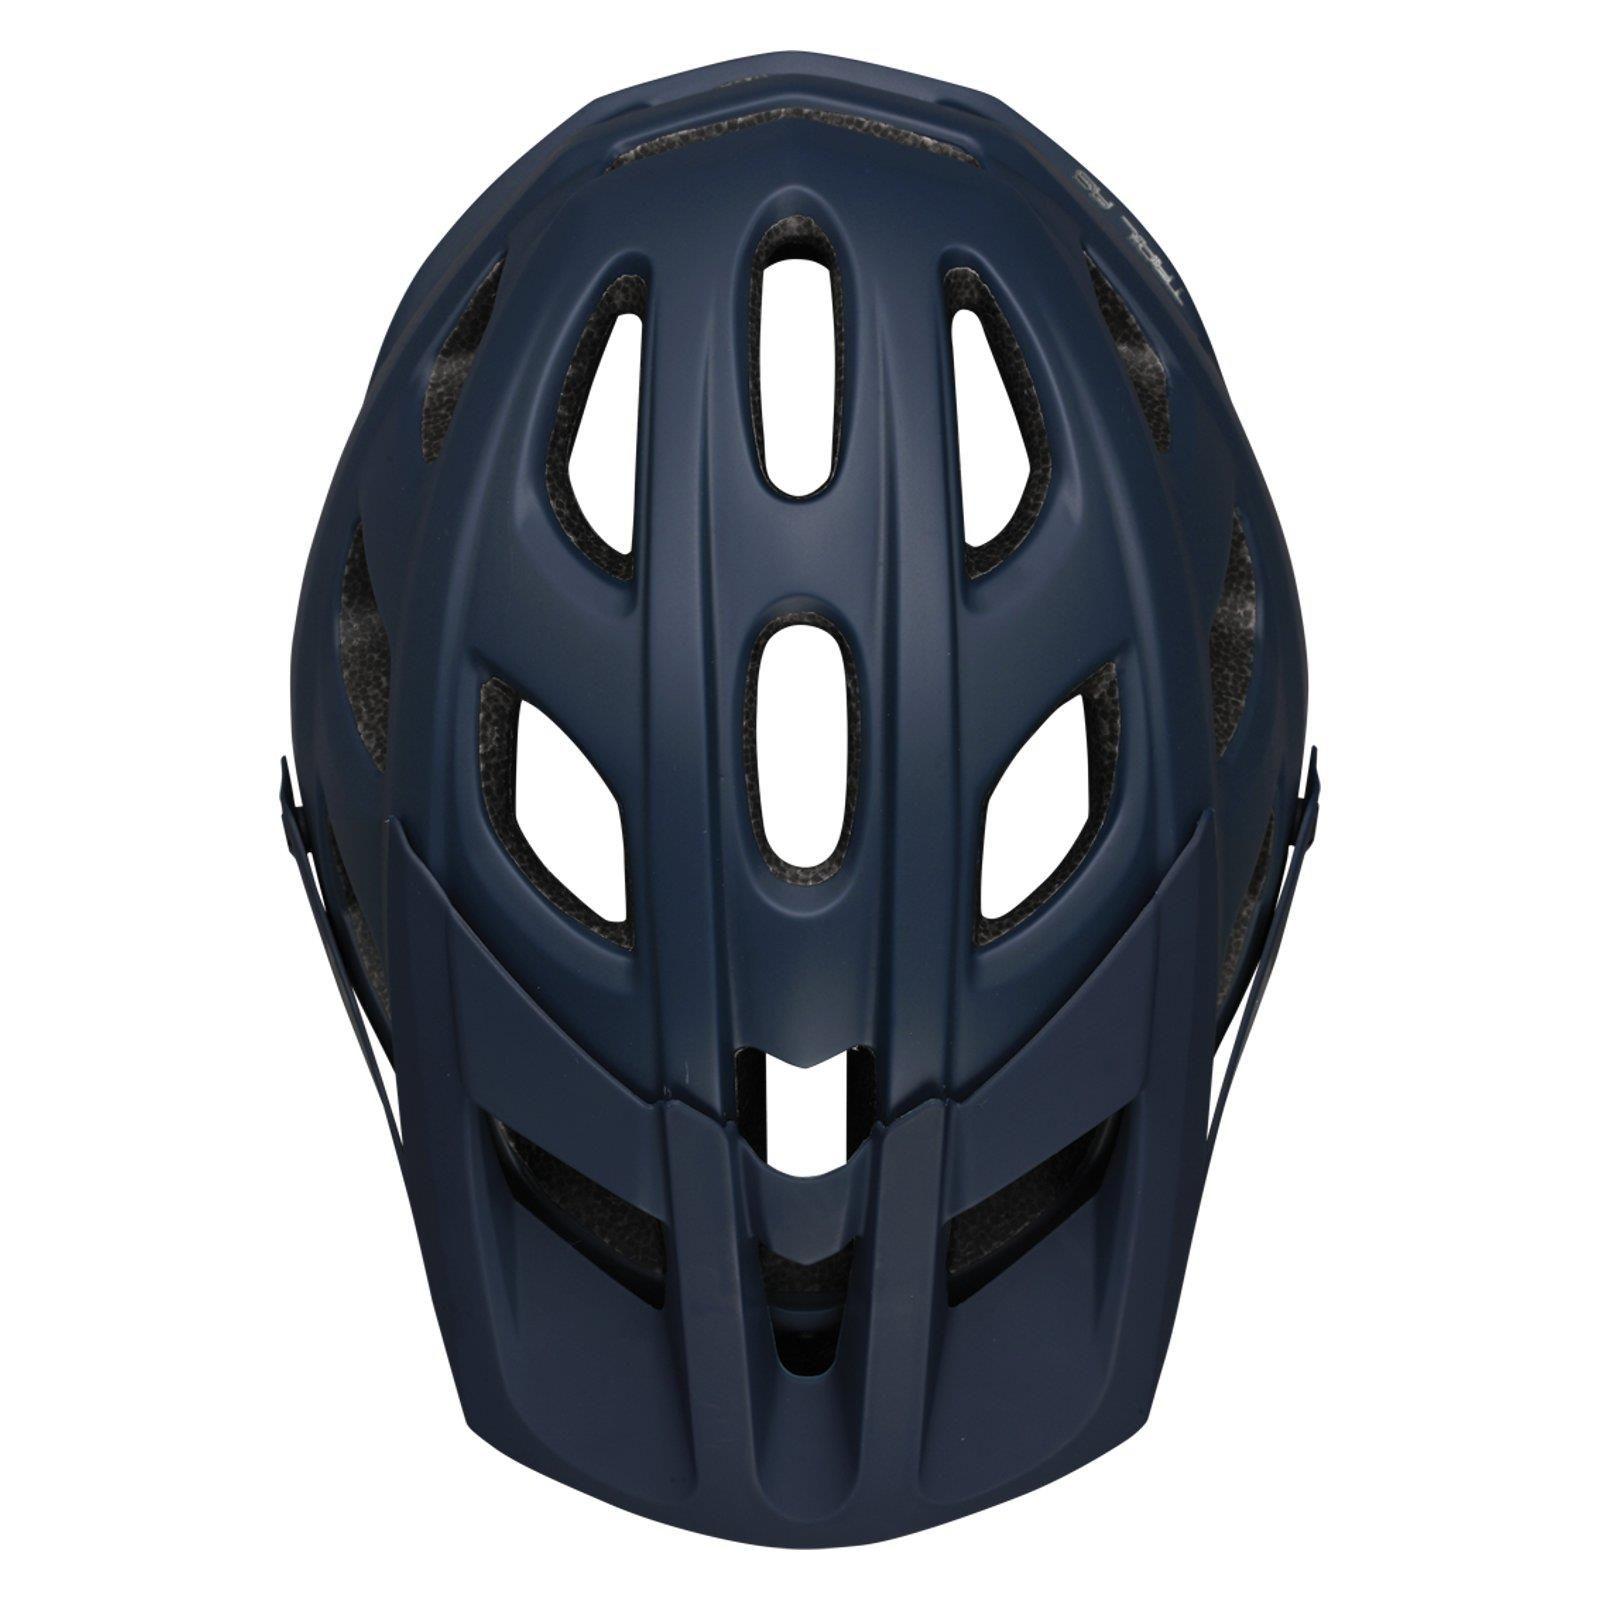 Ixs Trail Rs Evo Fahrrad Helm All Mountain Bike Am Mtb Enduro Dh Downhill Inmold Ad Sponsored Evo Fahrrad He With Images Enduro Mtb All Mountain Bike Mountain Biking